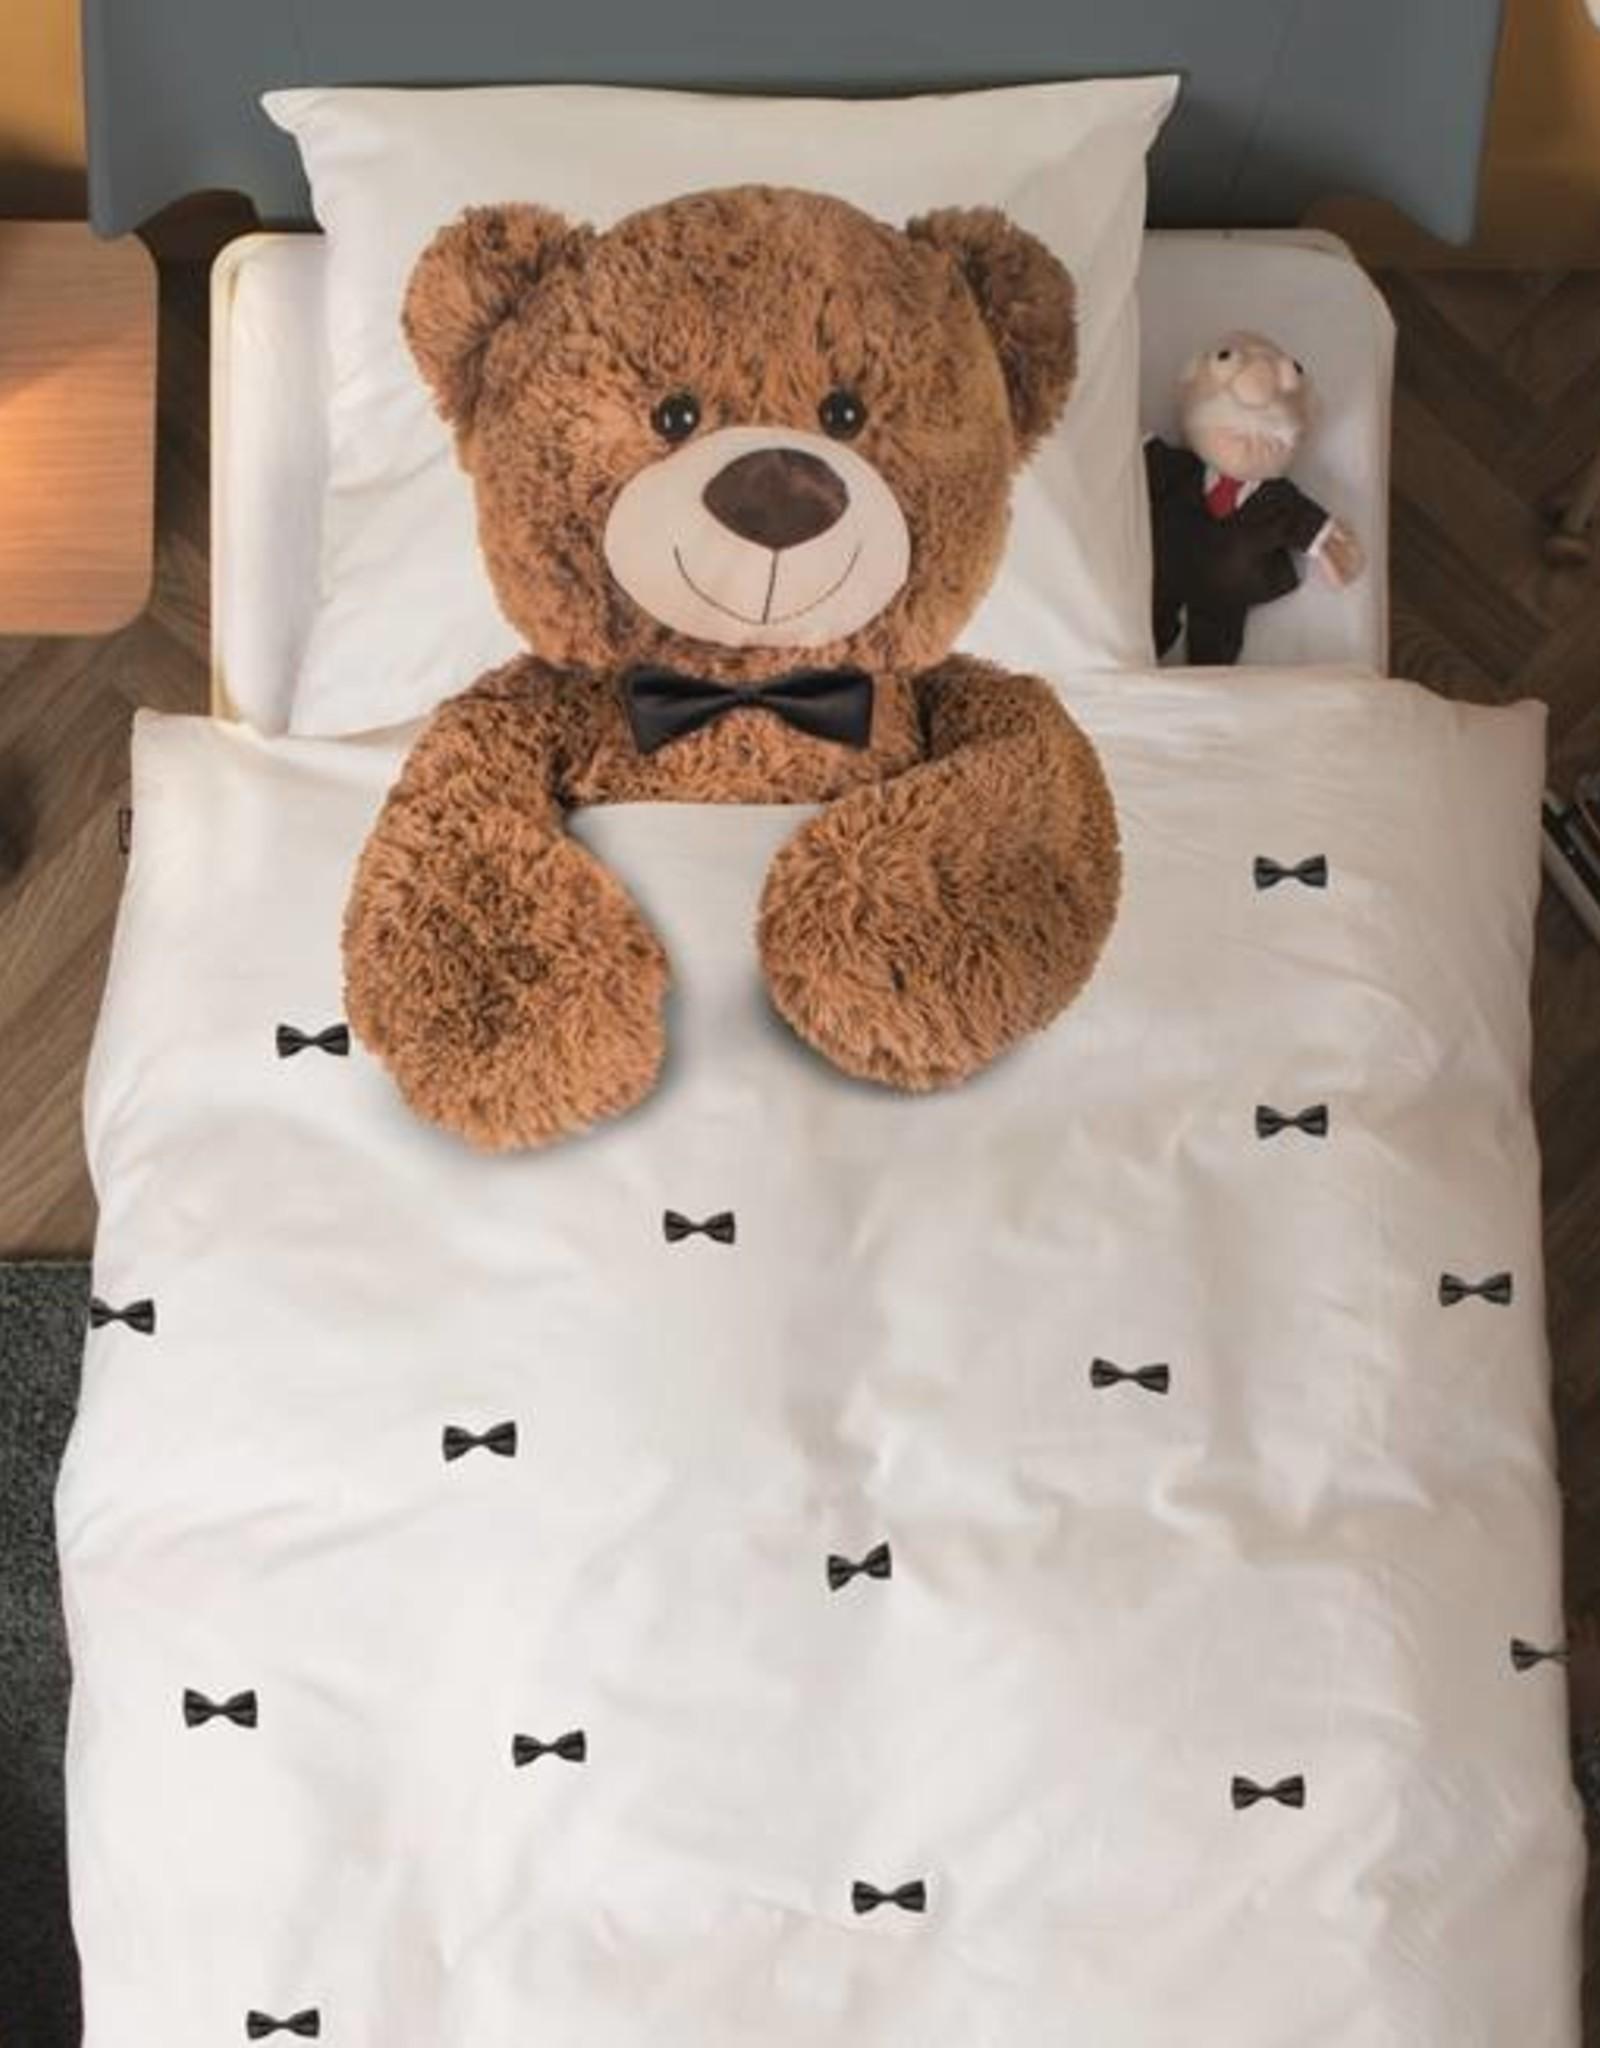 Snurk Dekbedovertrek Snurk Teddy Flanel